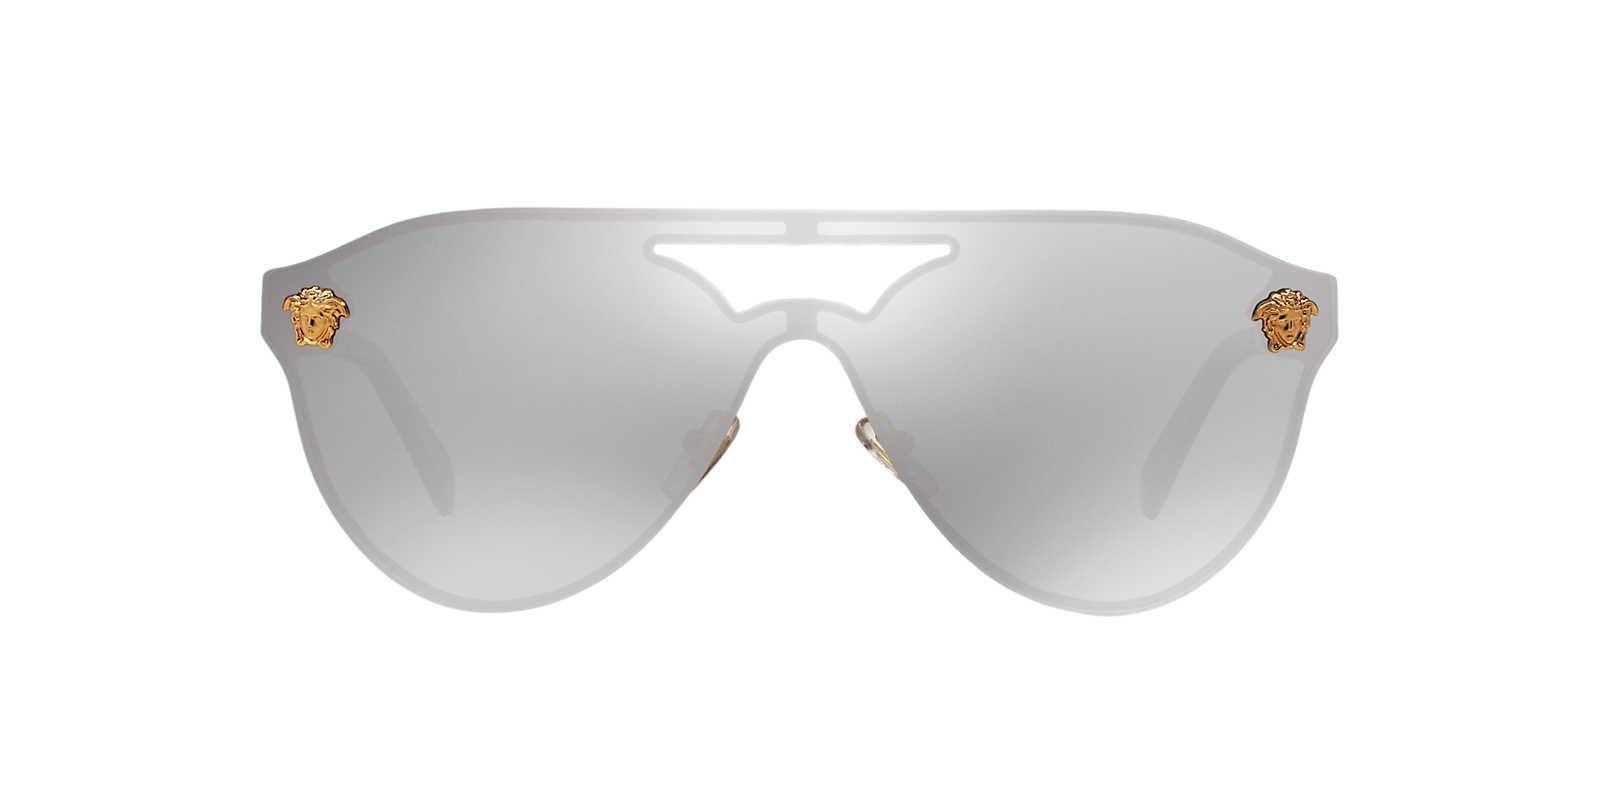 Frame glasses versace - Versace